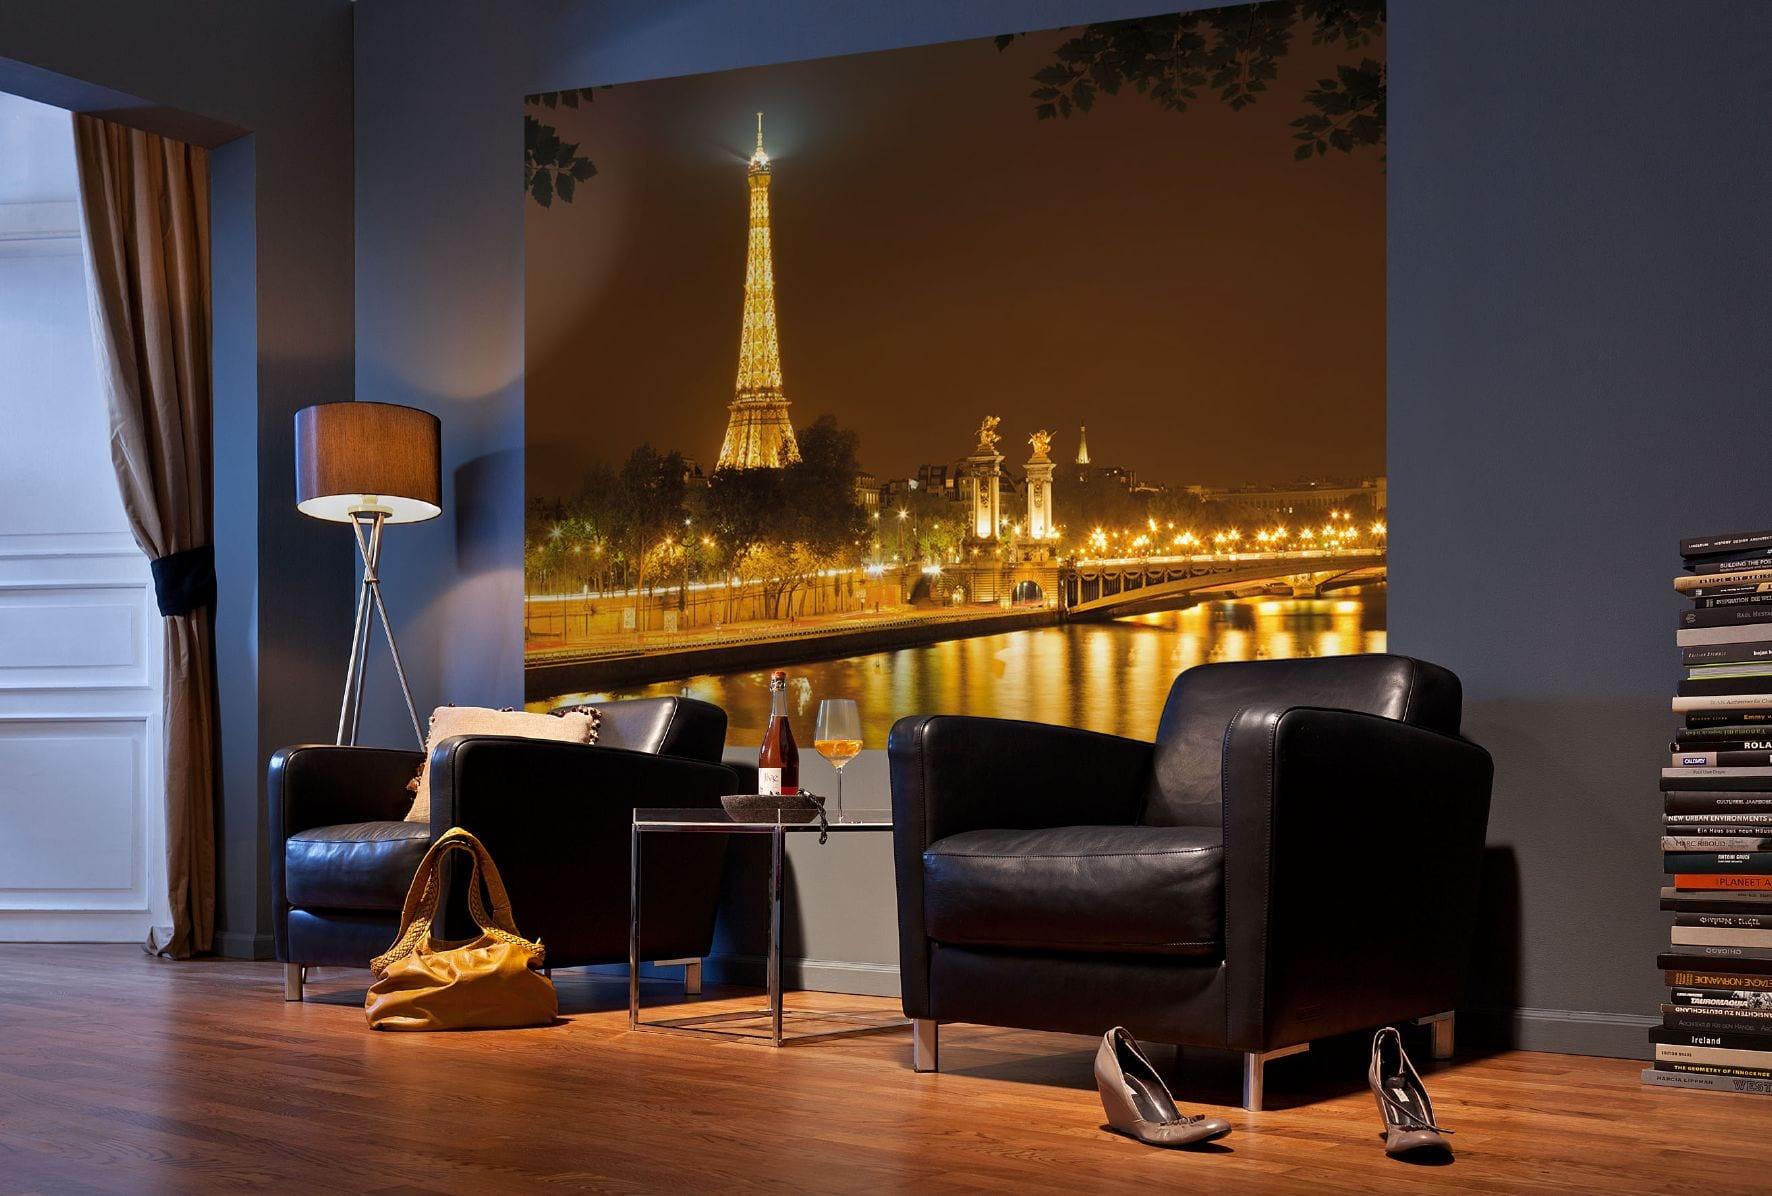 Fotomural Torre Eiffel Paris 4321 Komar